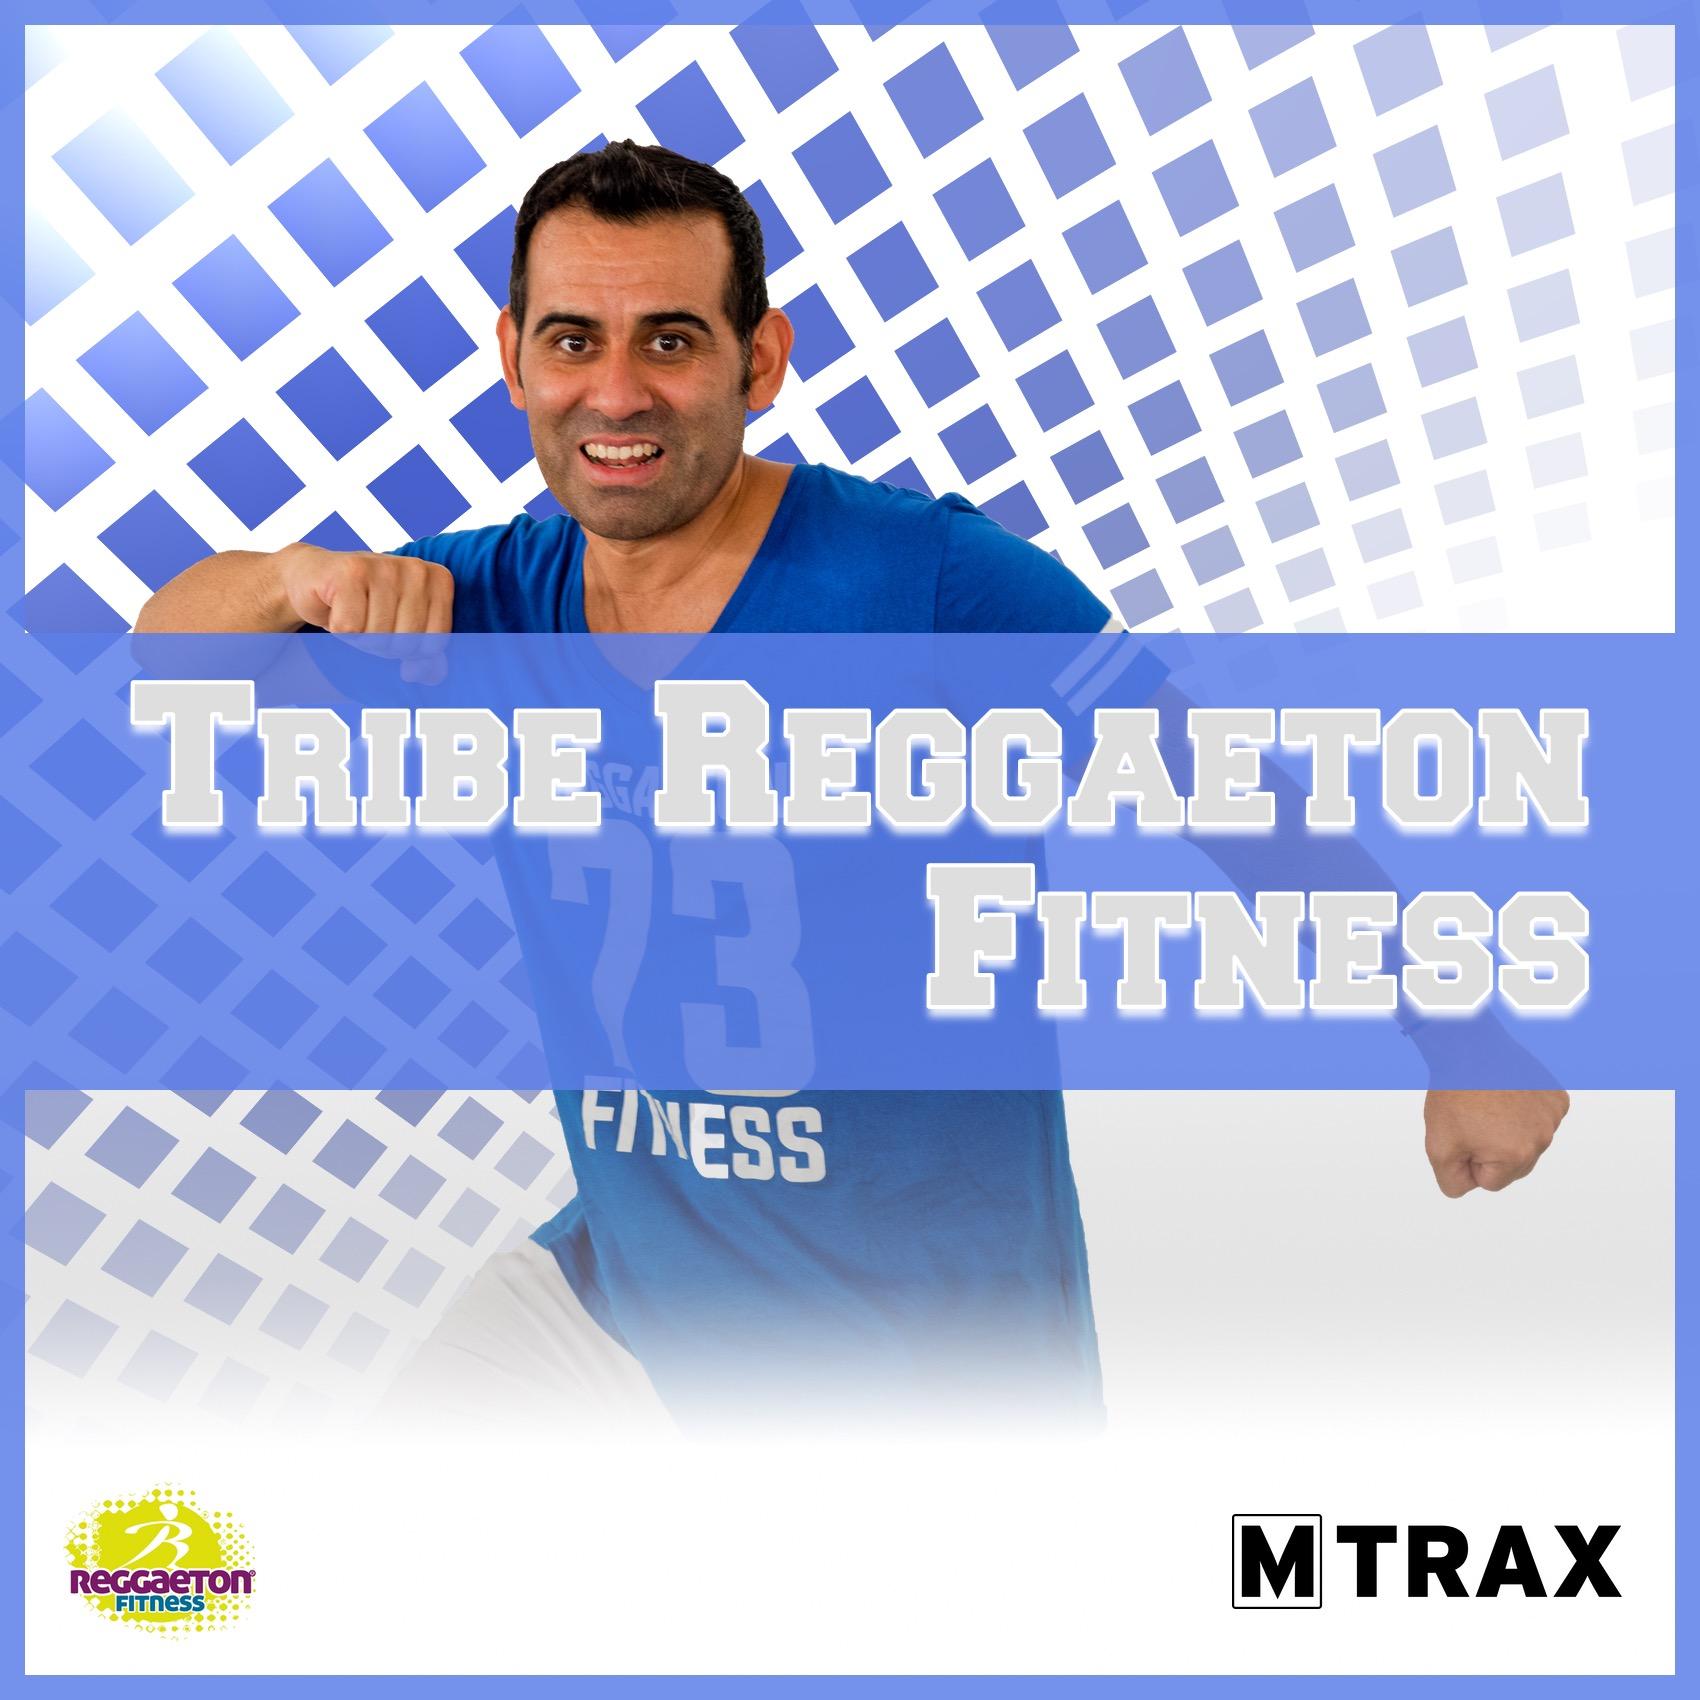 Tribe Reggaeton Fitness - MTrax Fitness Music